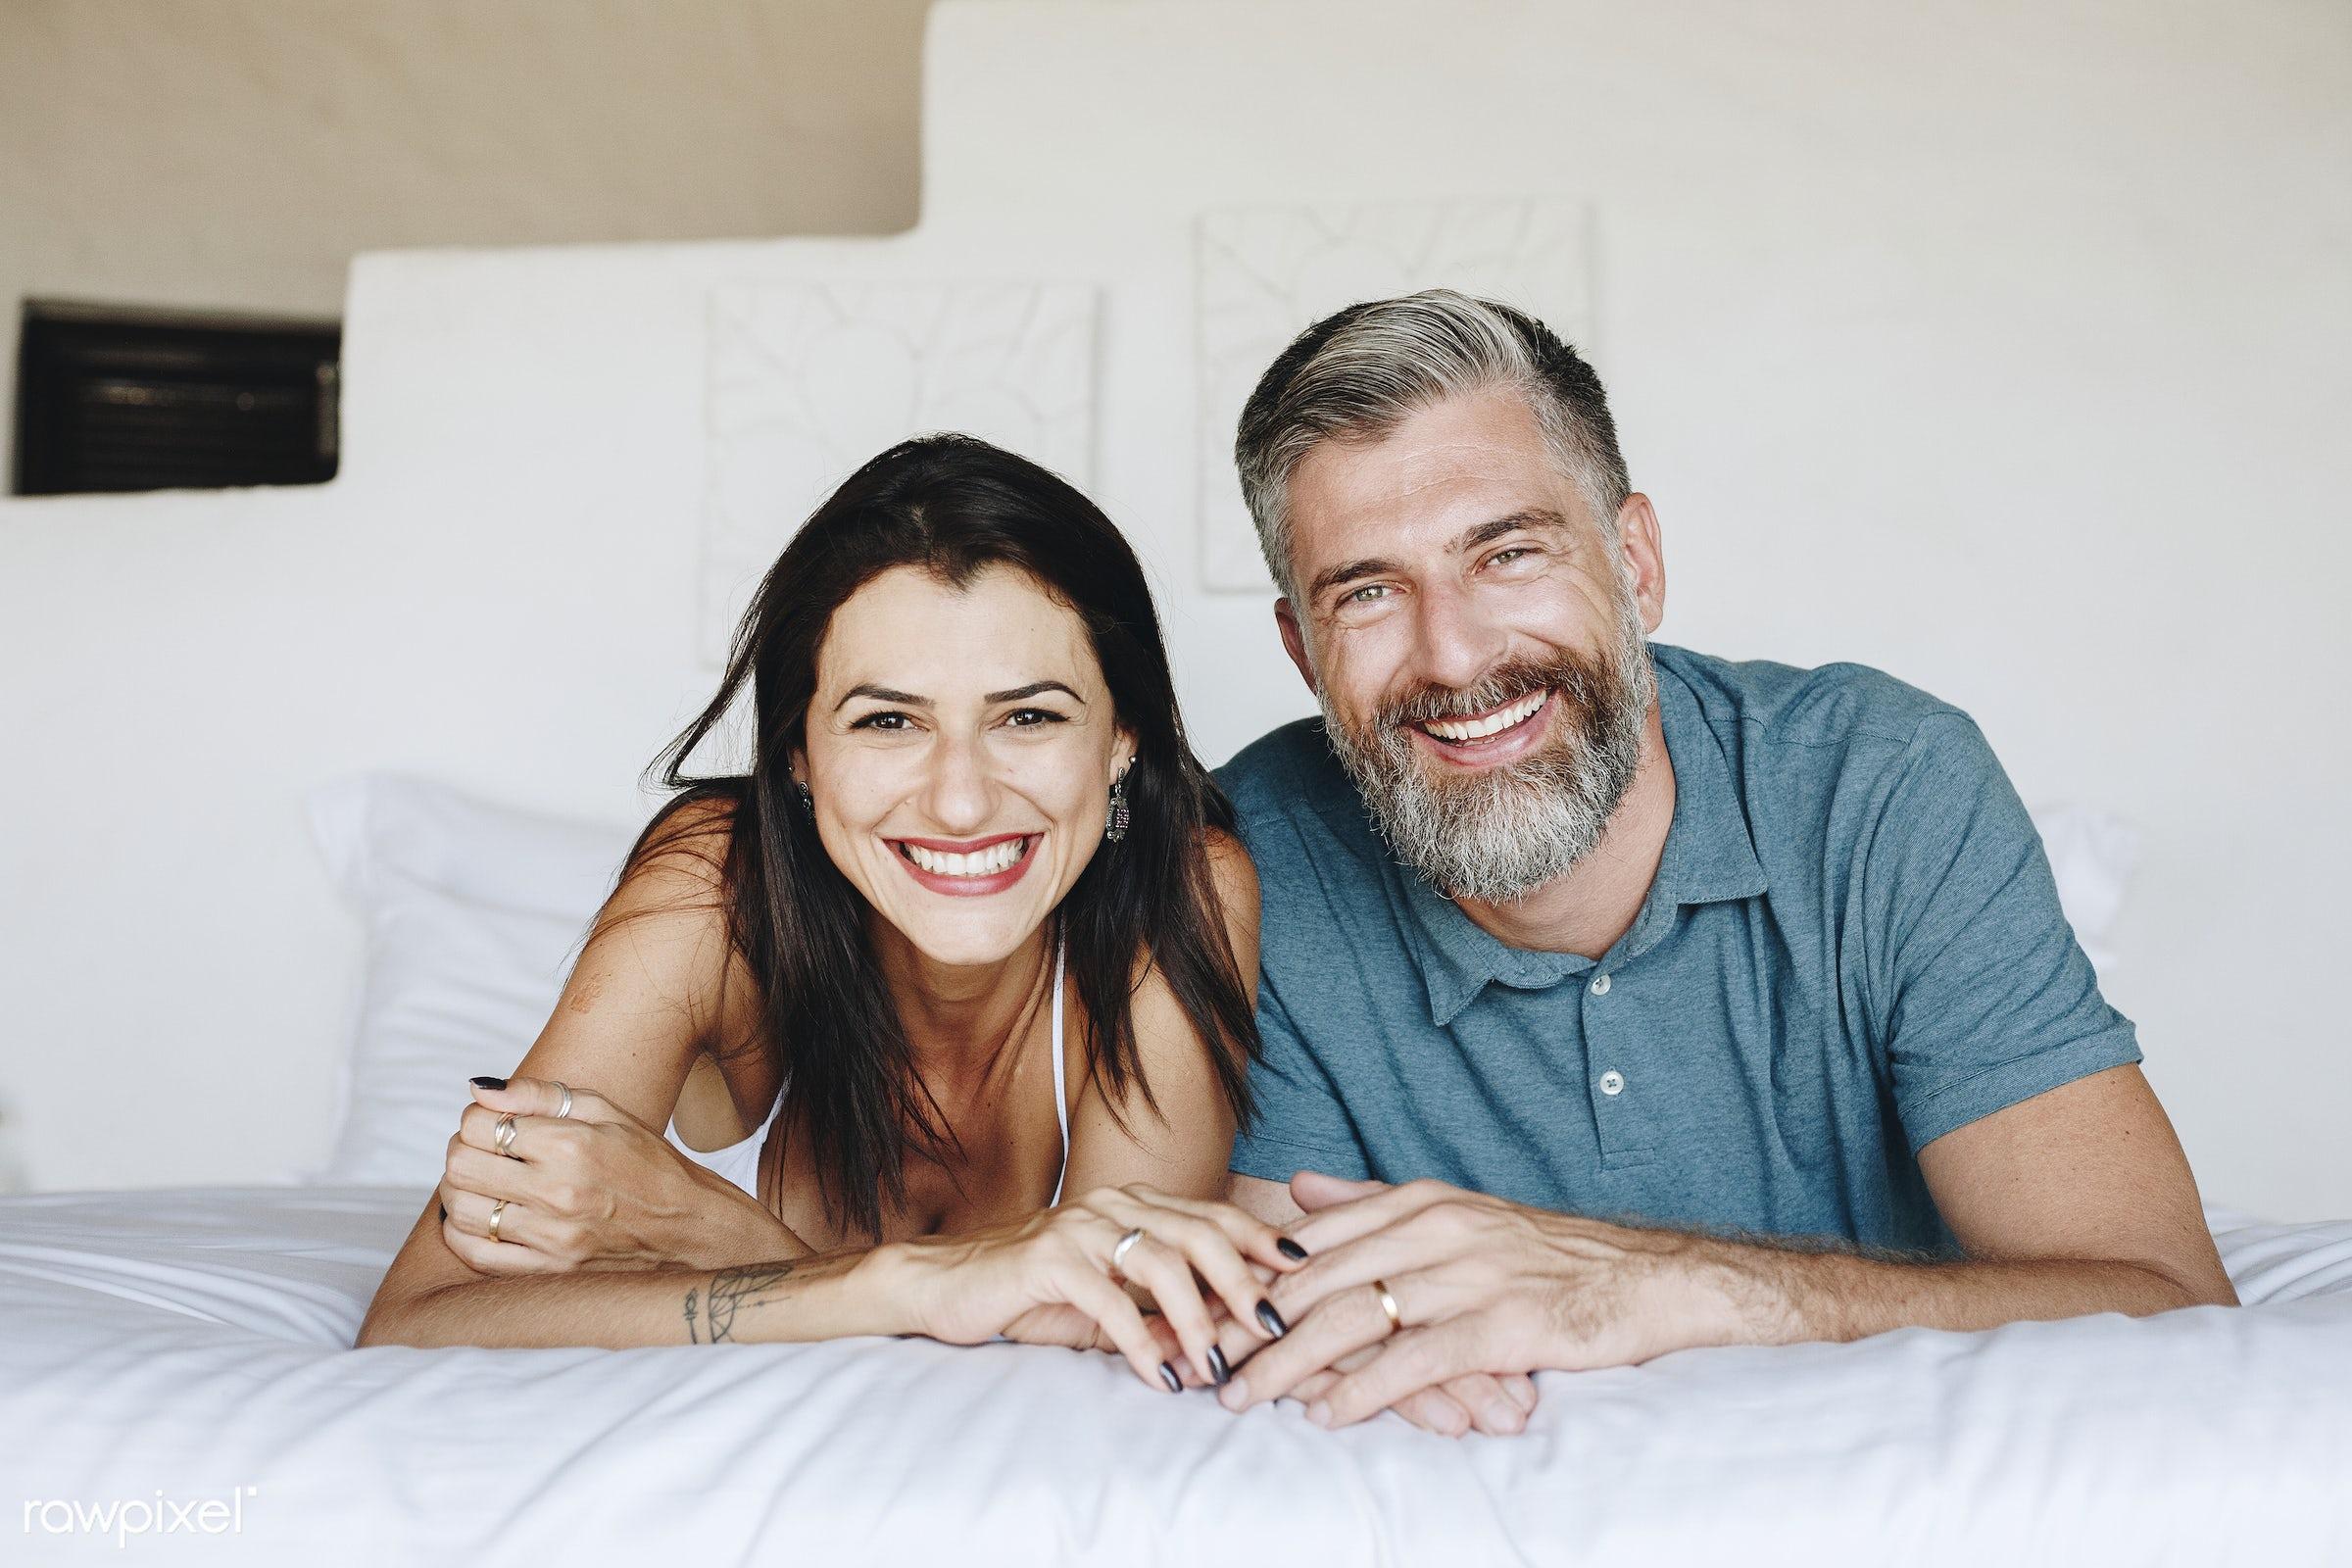 yli 50s dating virasto